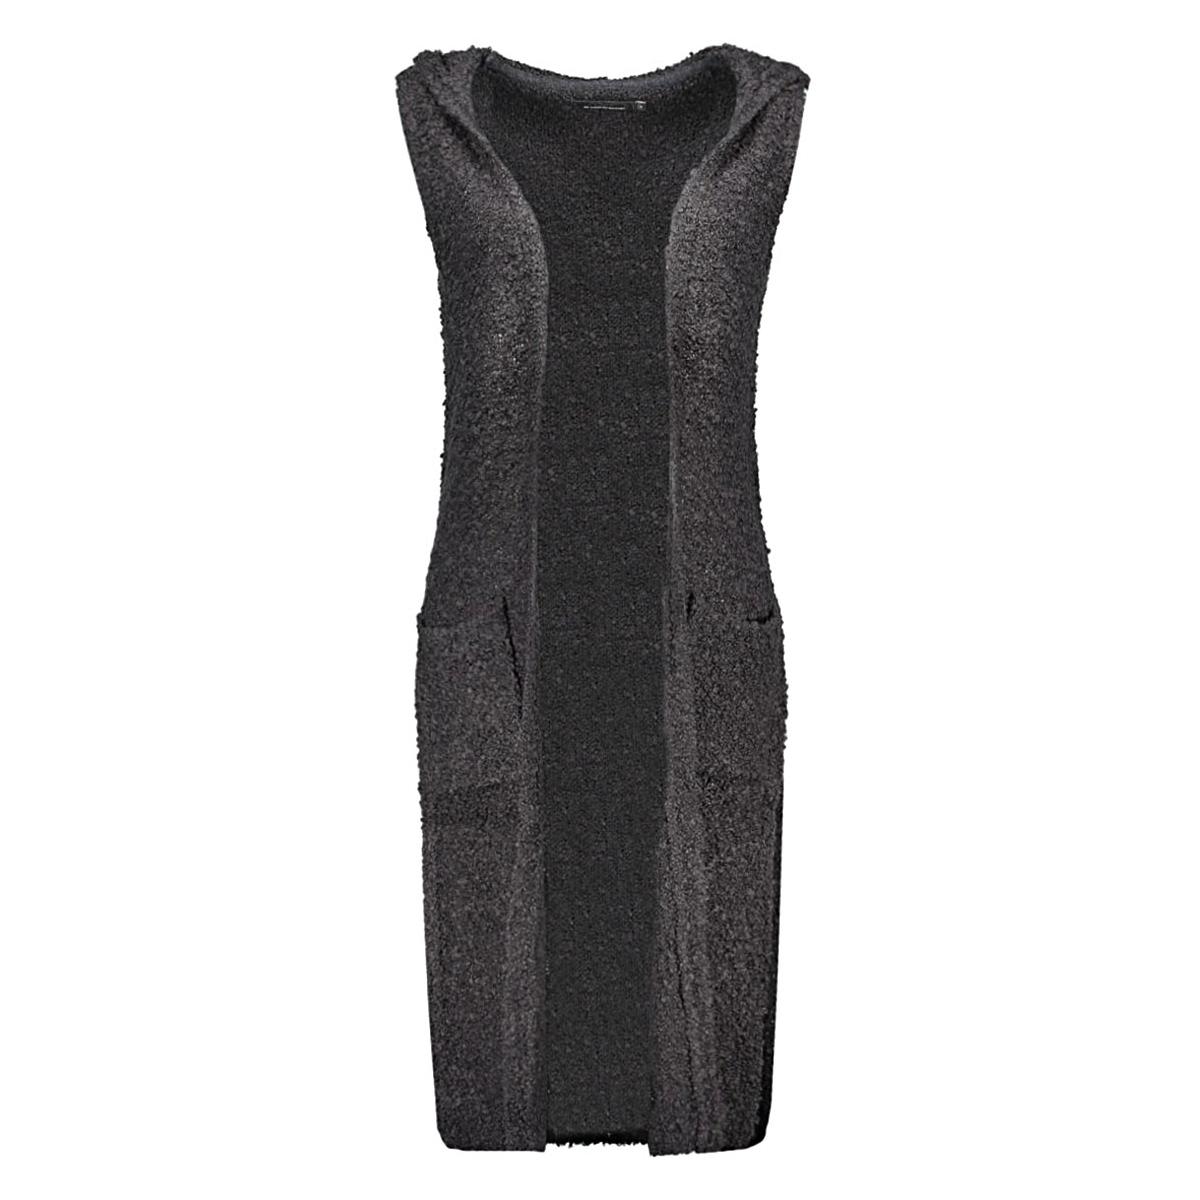 onlnew zadie s/l hood waistcoat knt 15121240 only vest dark navy/ w. black m